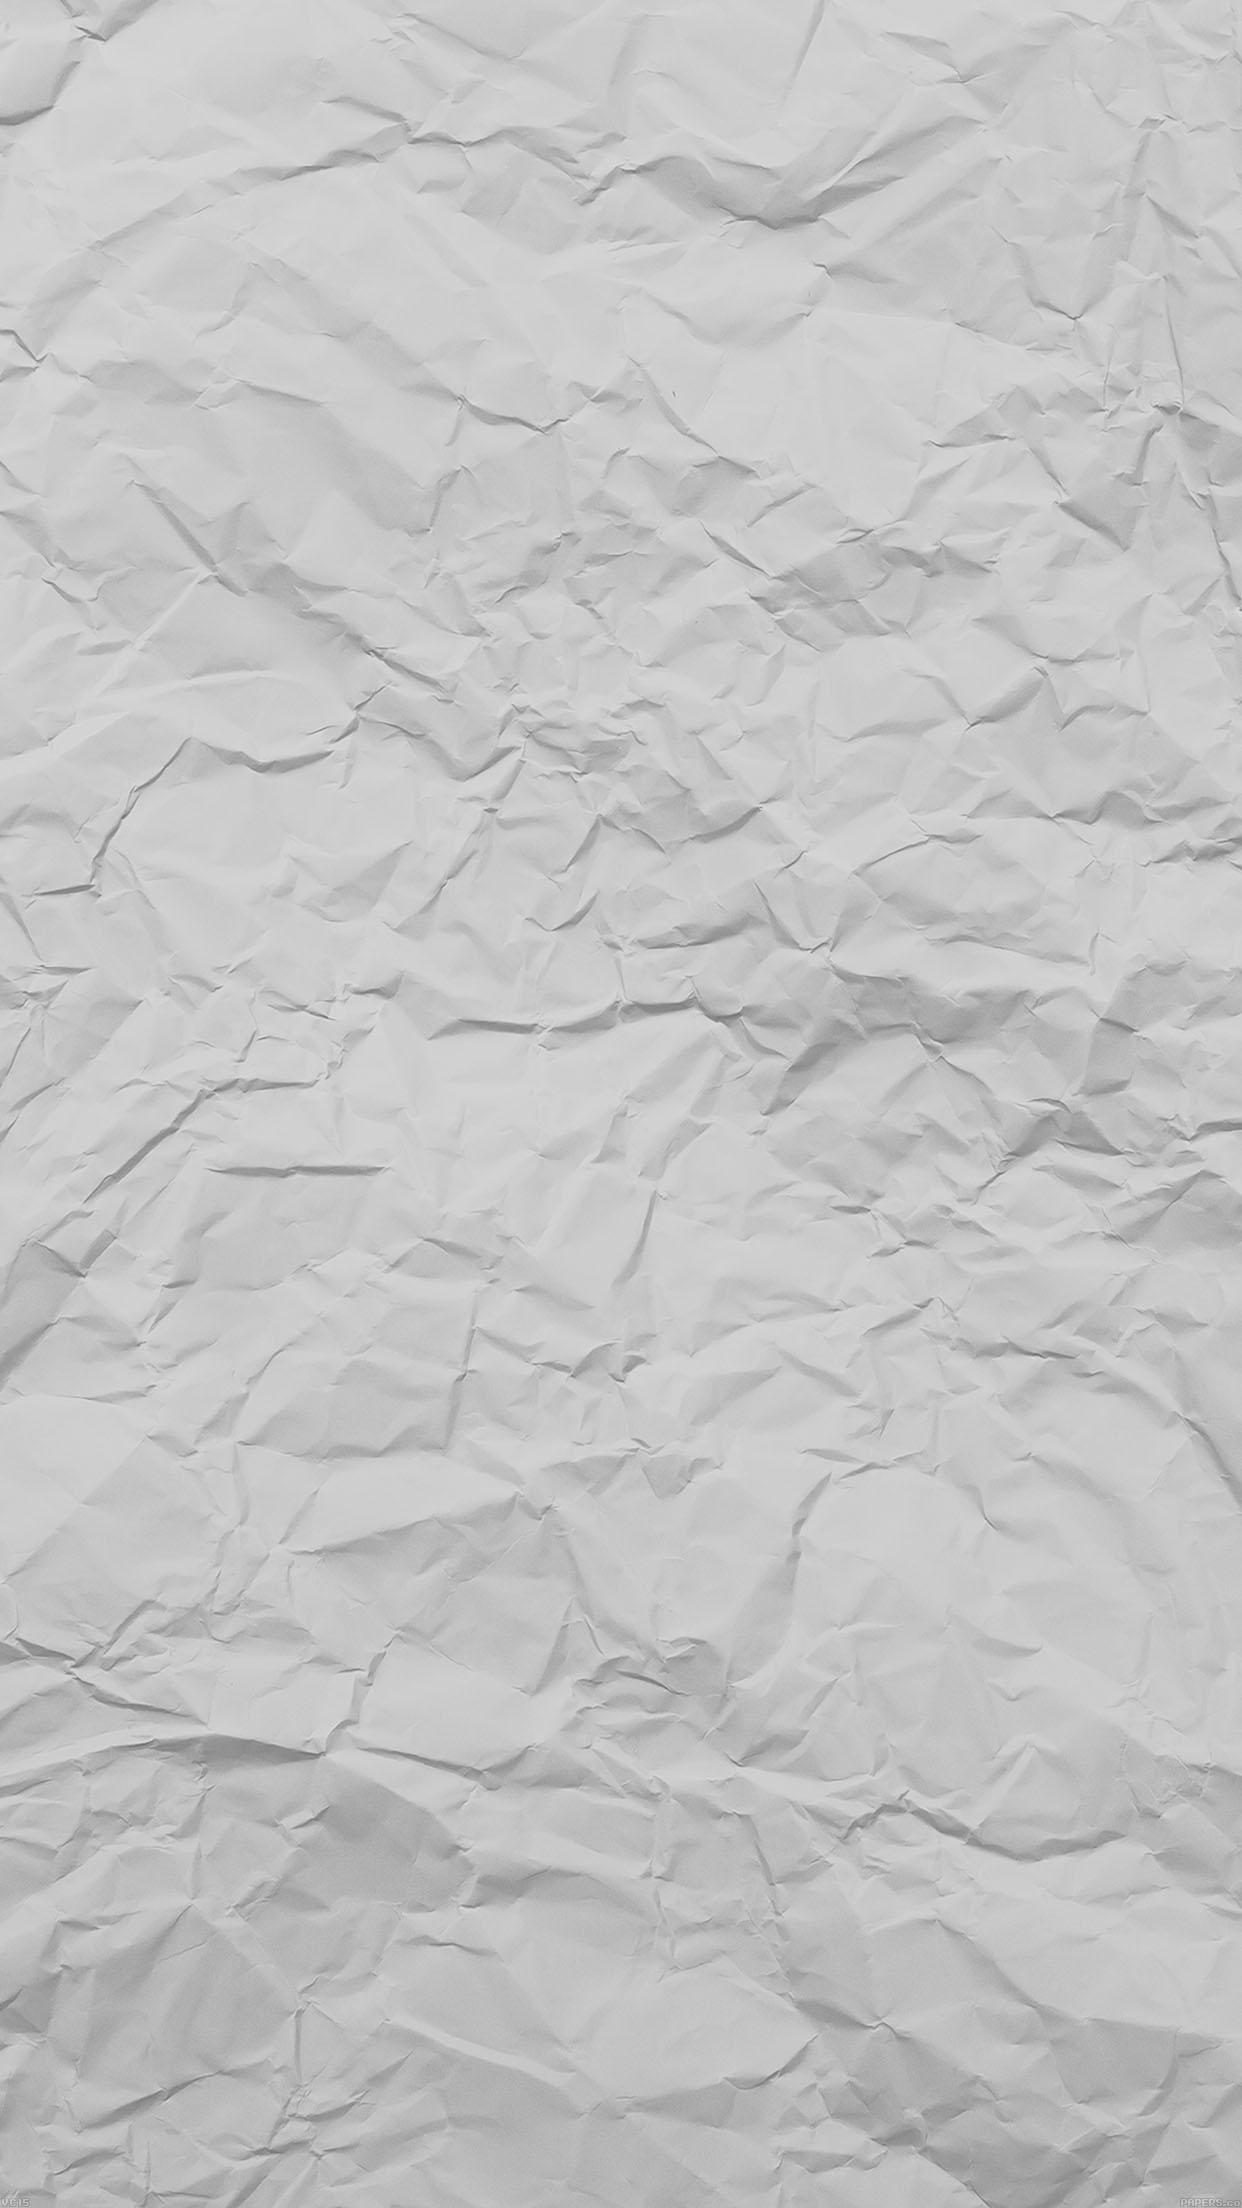 Simple Wallpaper Marble Ios - papers  Pic_524935.jpg